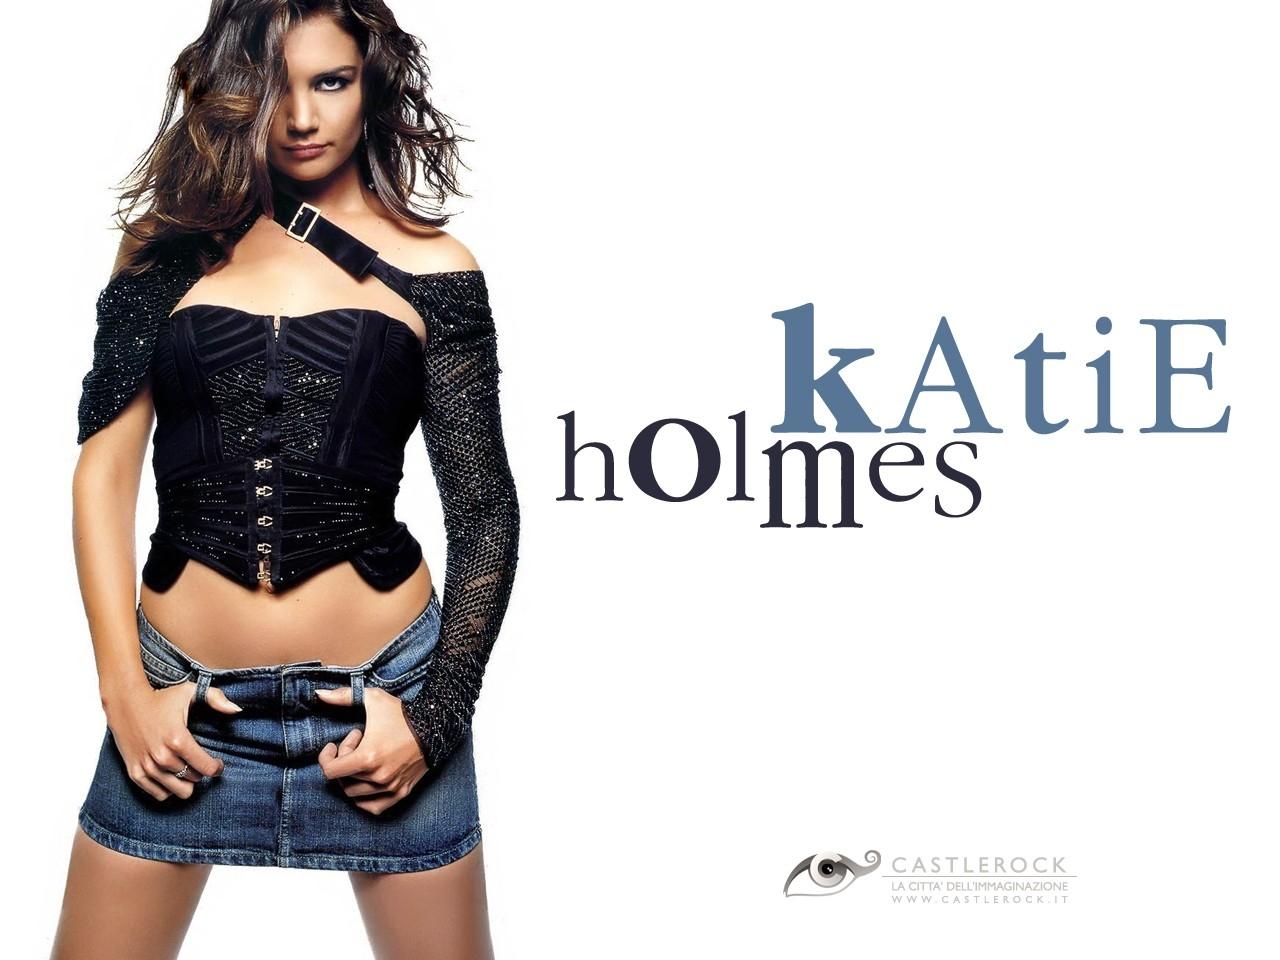 Wallpaper di Katie Holmes in jeans